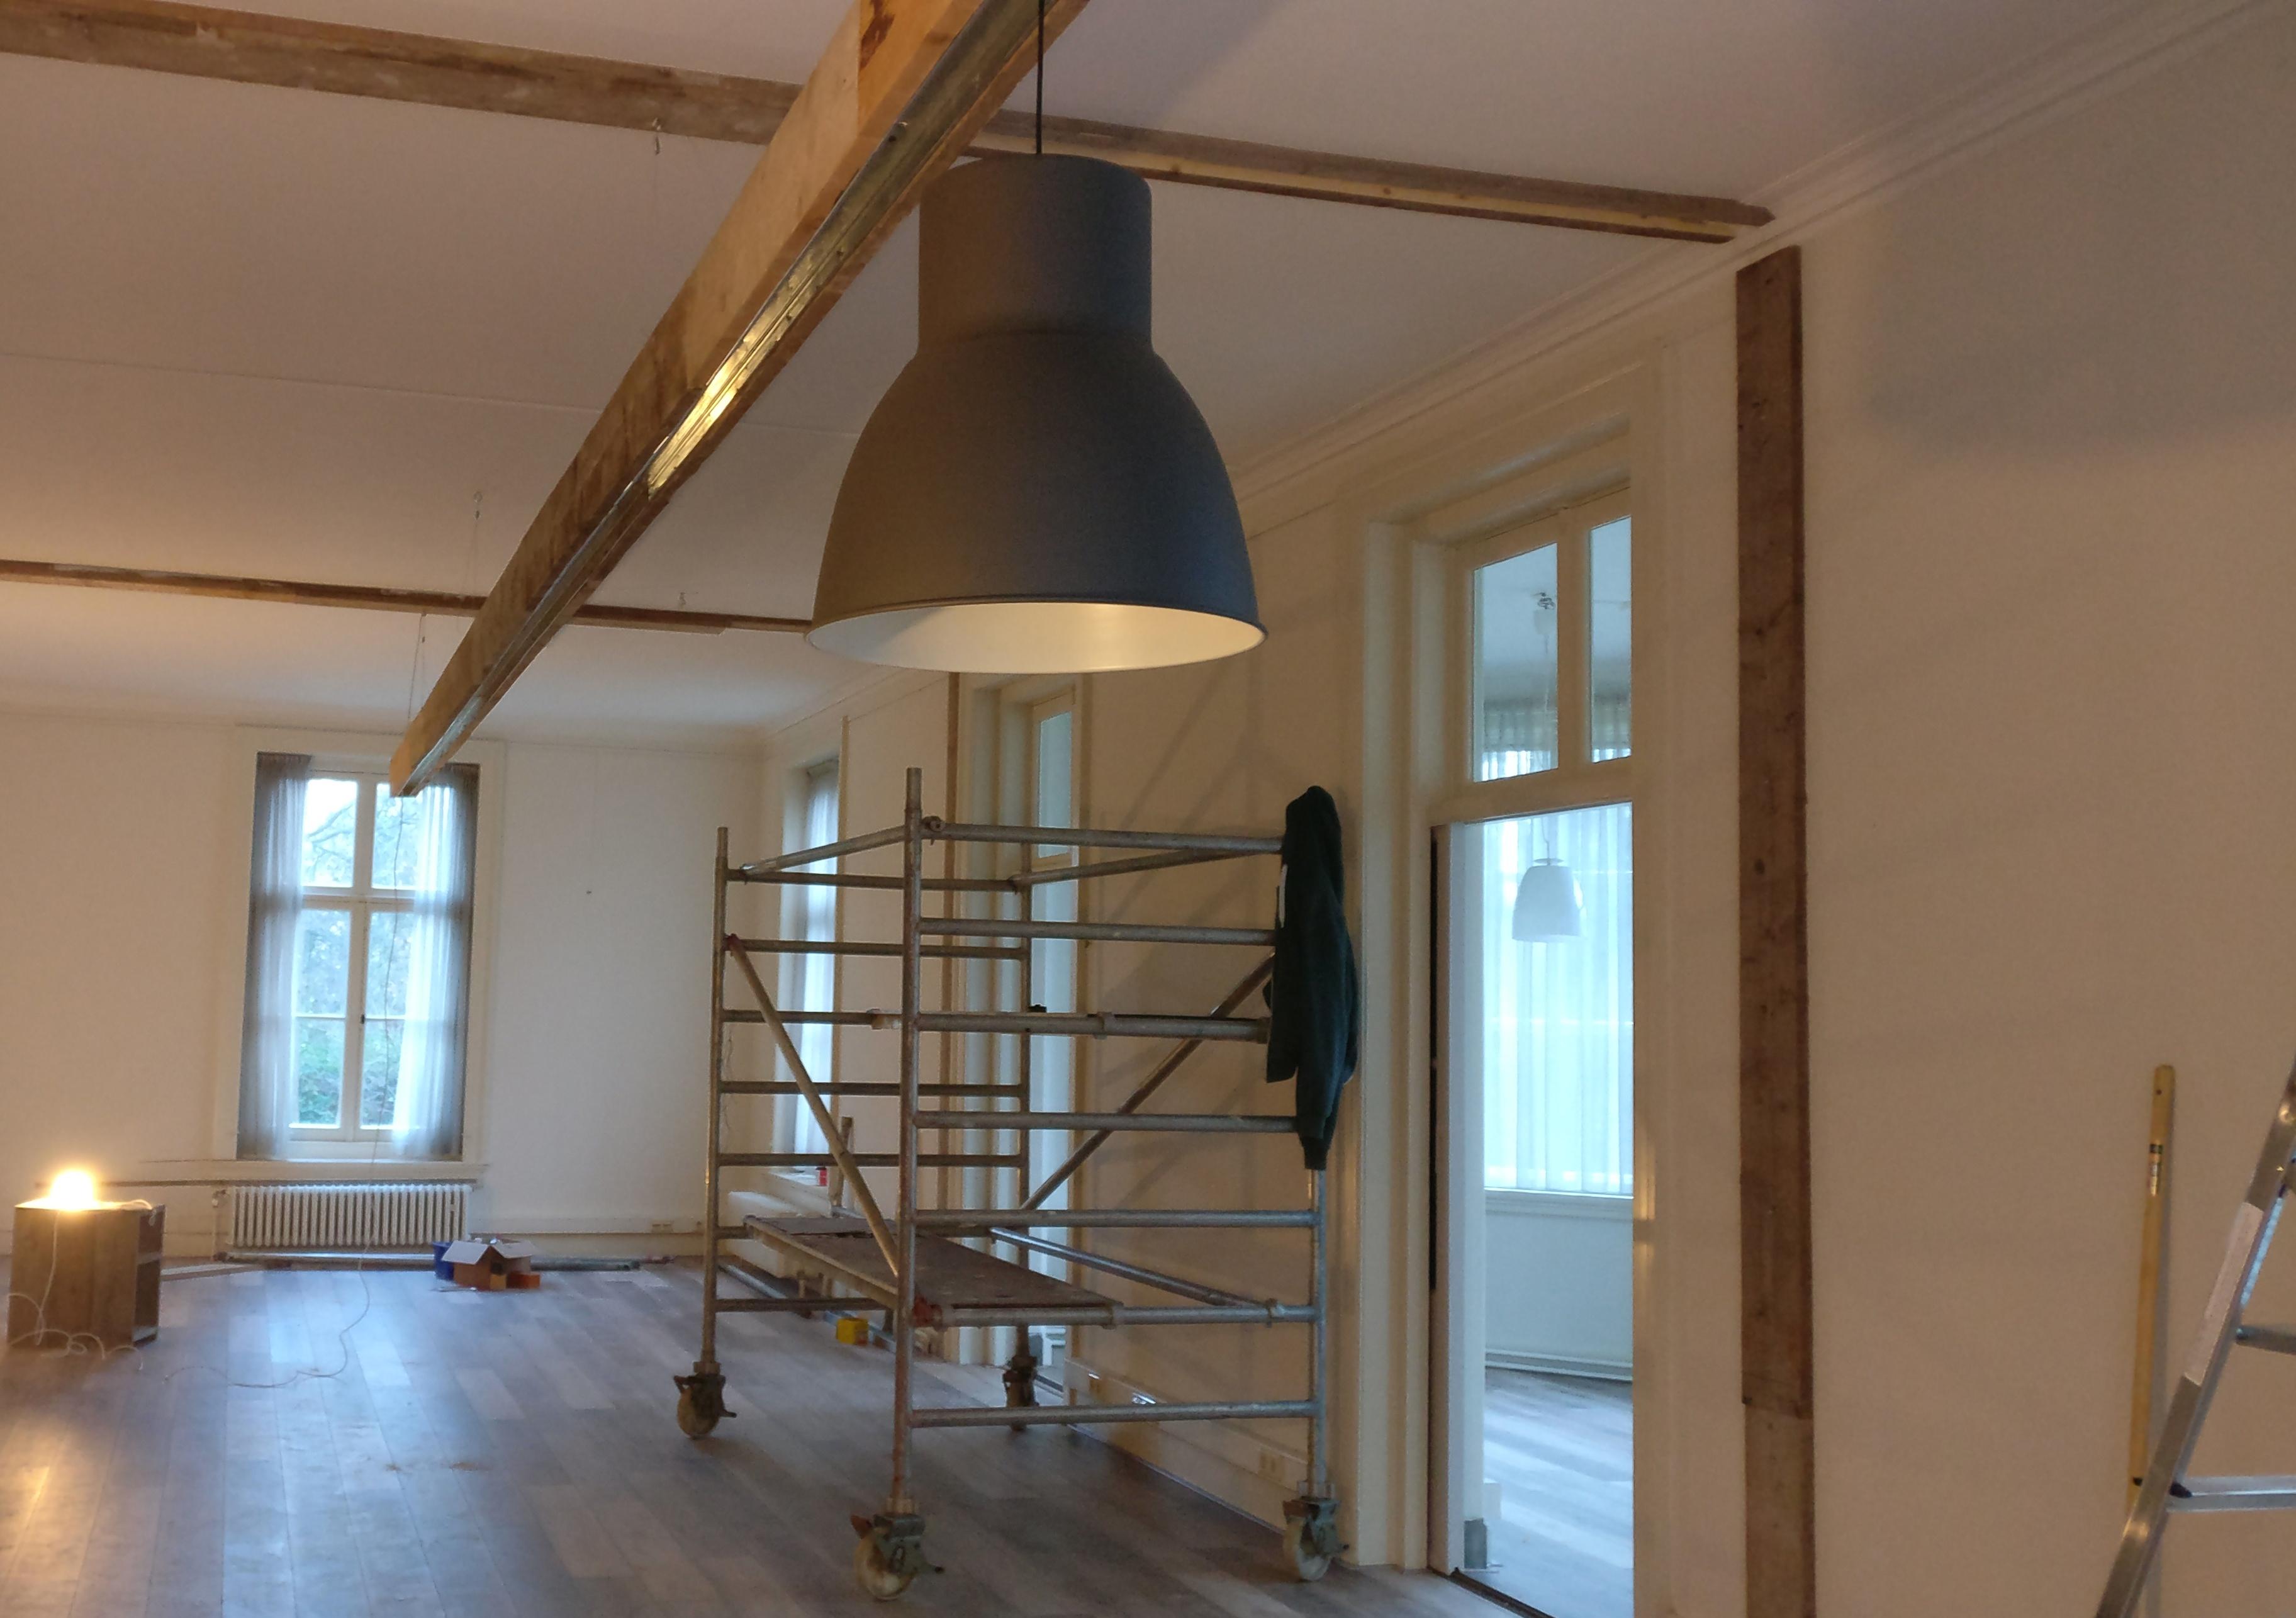 blog_nieuwkantoor_lamp3.jpg